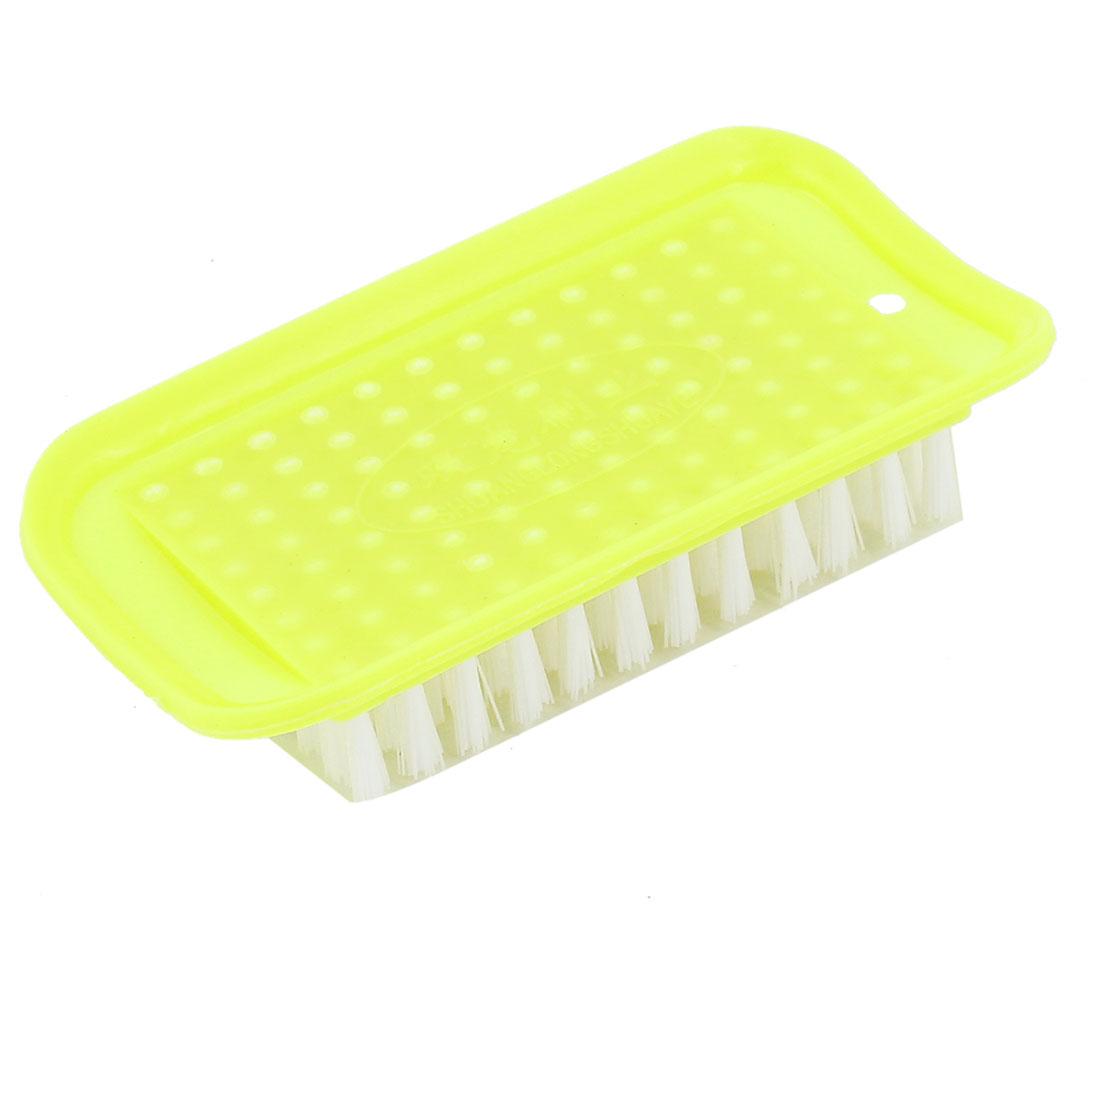 Yellow Rectangle Shaped Plastic Household Laundry Brush